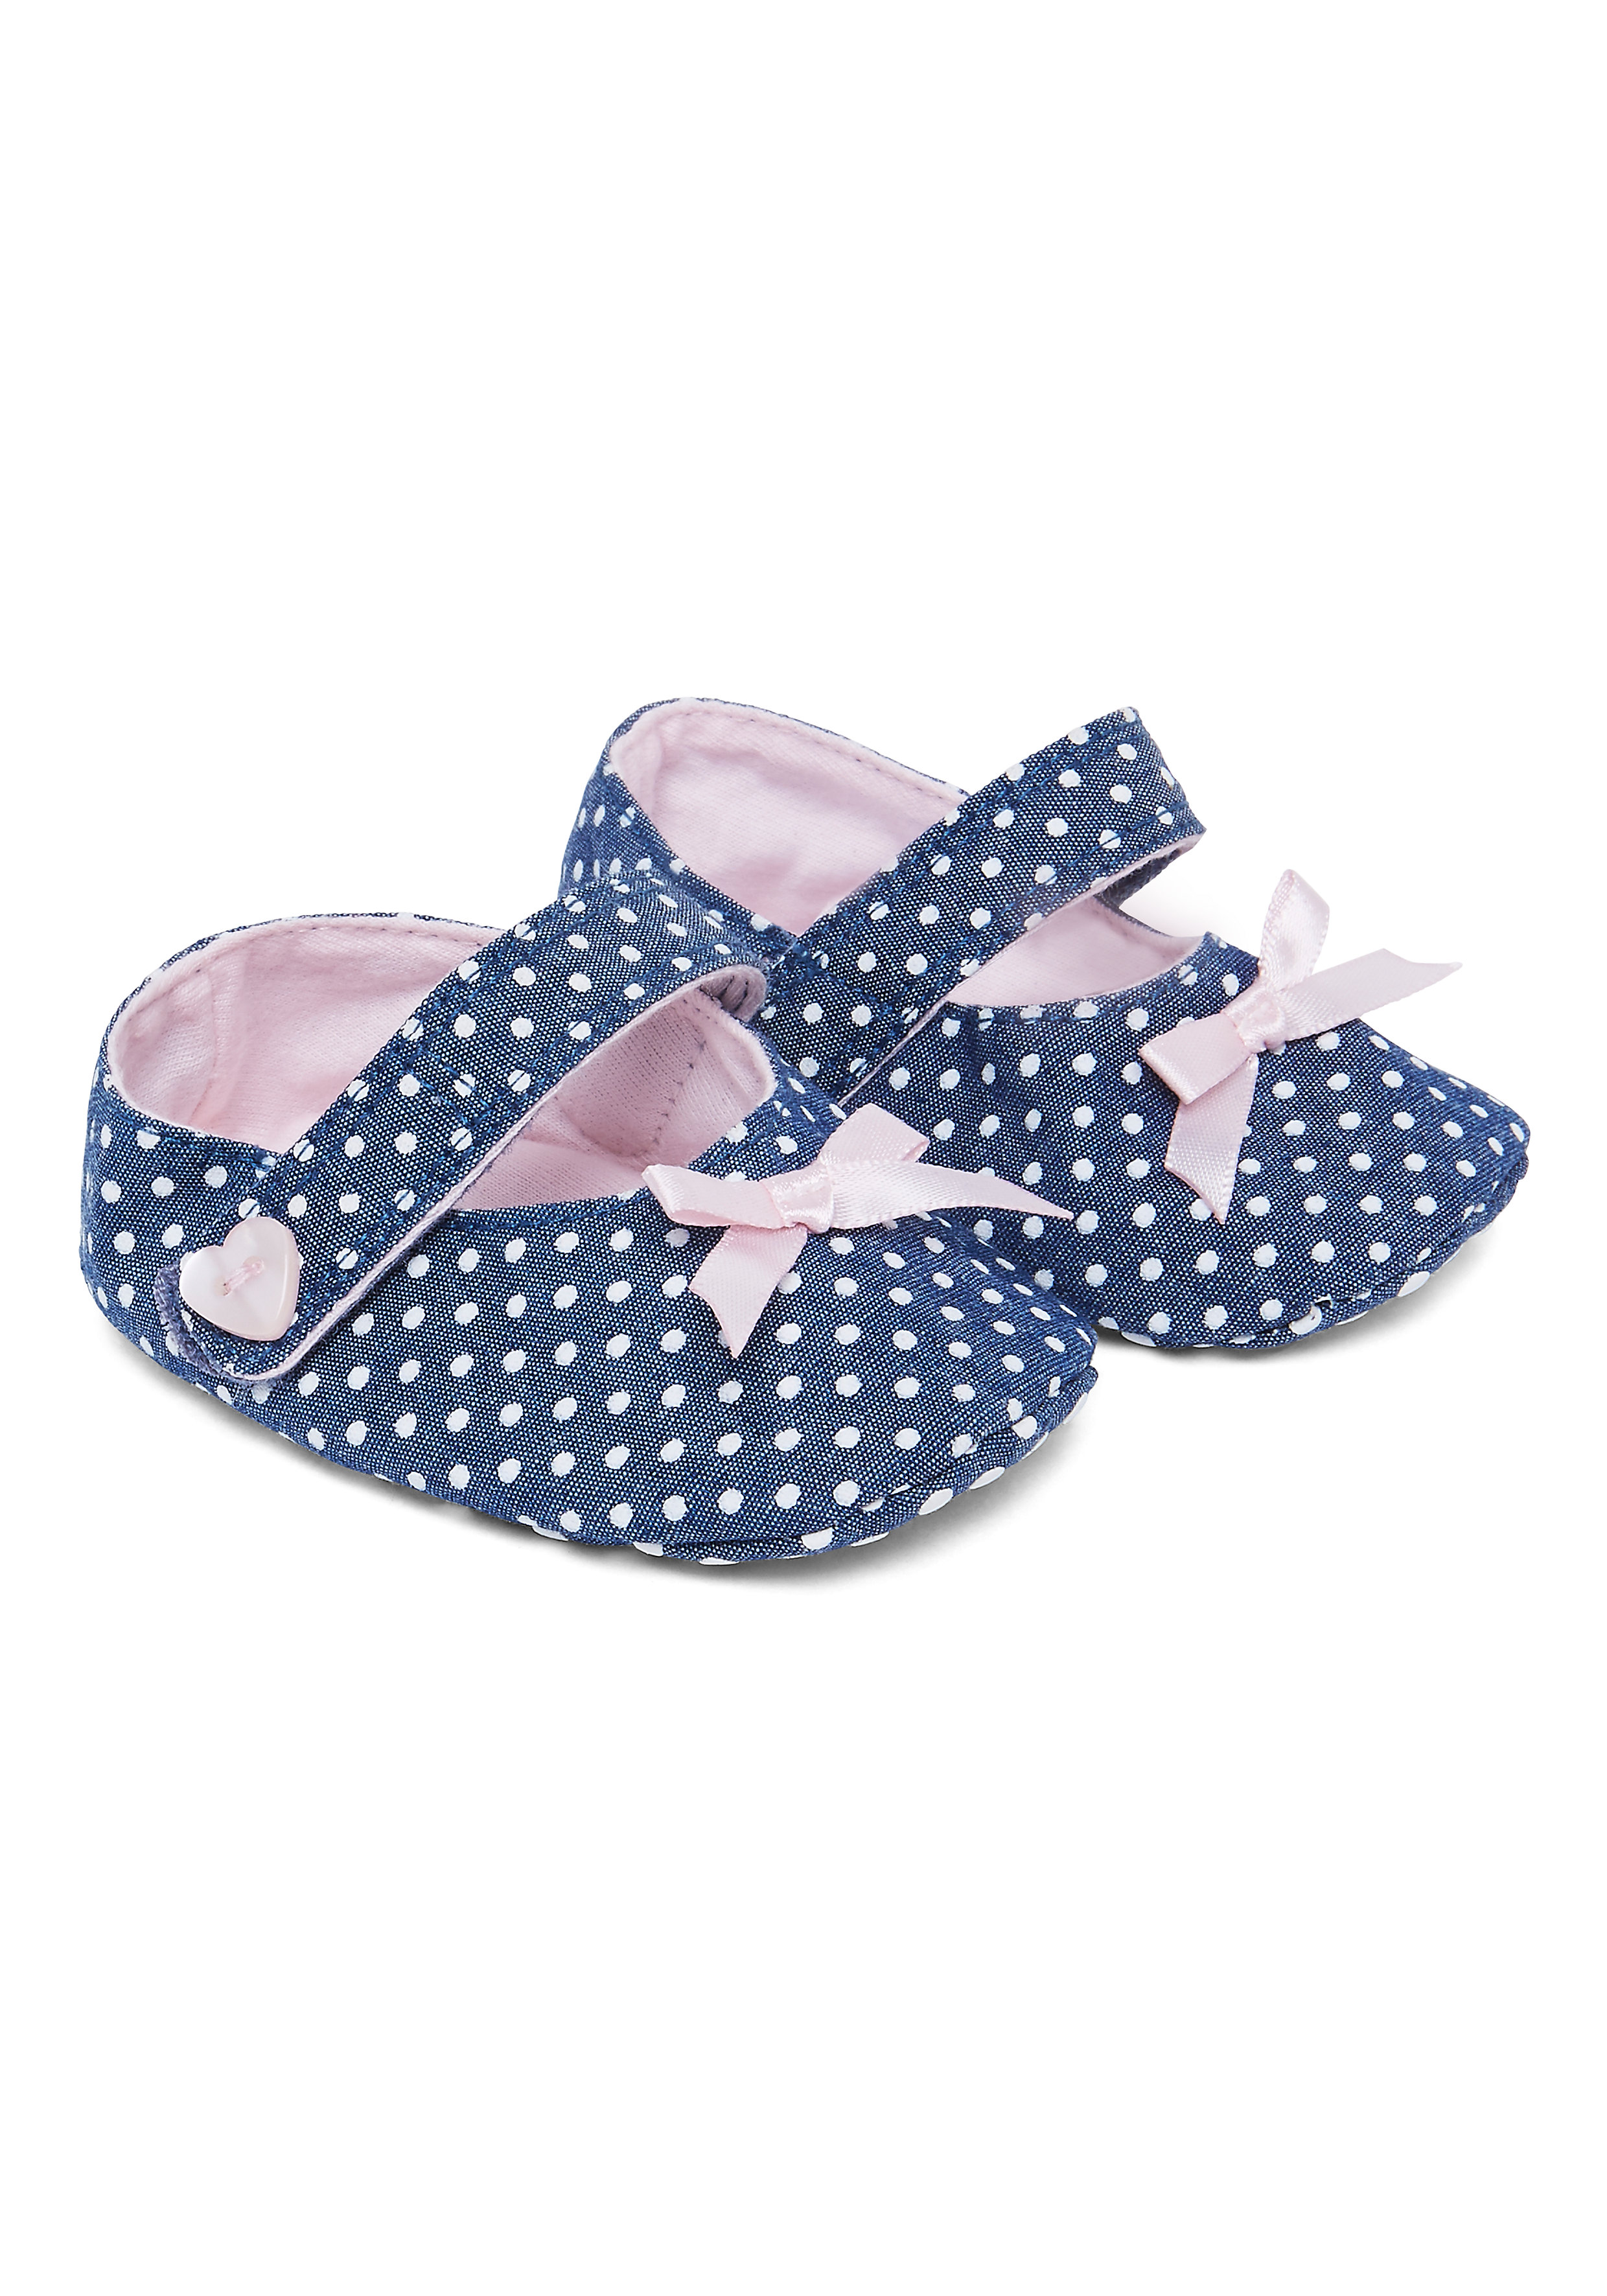 Mothercare | Girls Spotty Denim Mary Jane Shoes - Navy